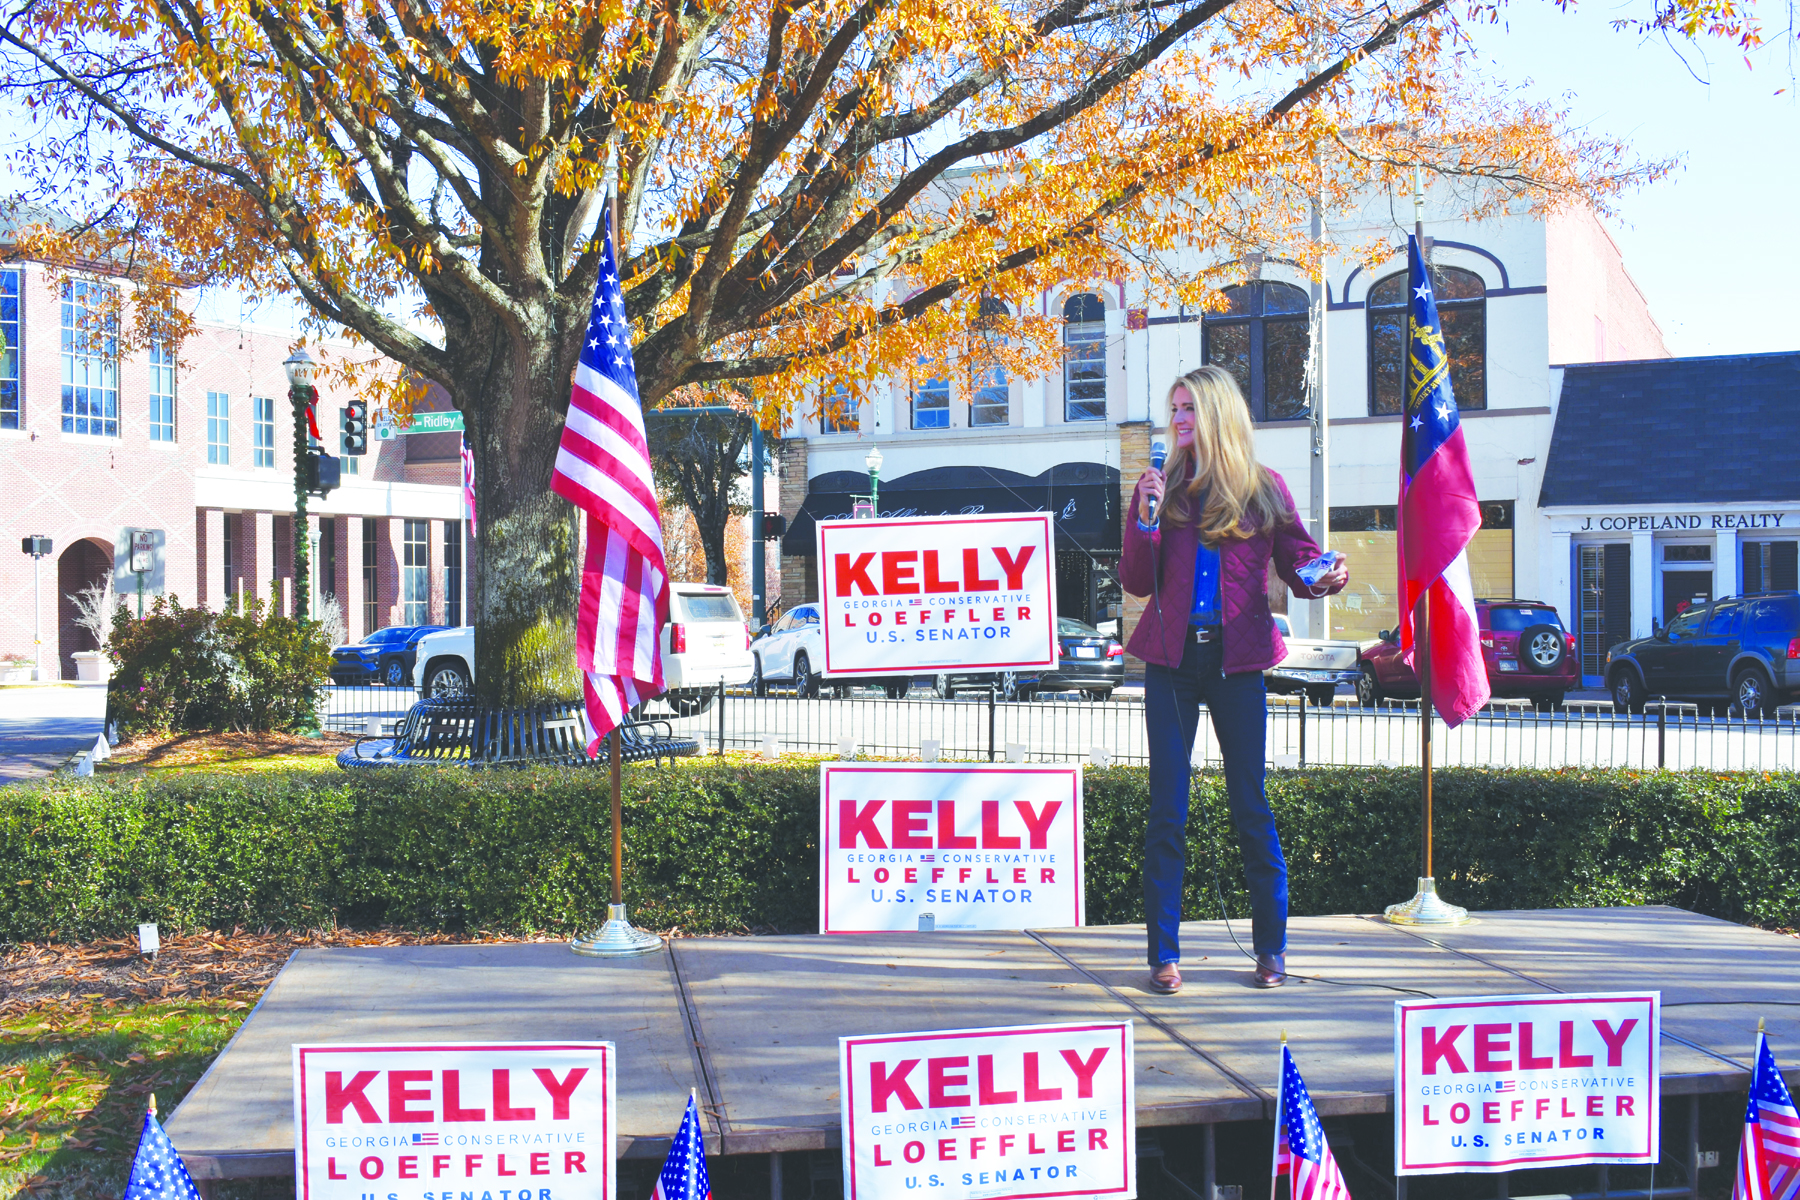 Senator Kelly Loeffler Visits LaGrange, Defends American Flag and Values